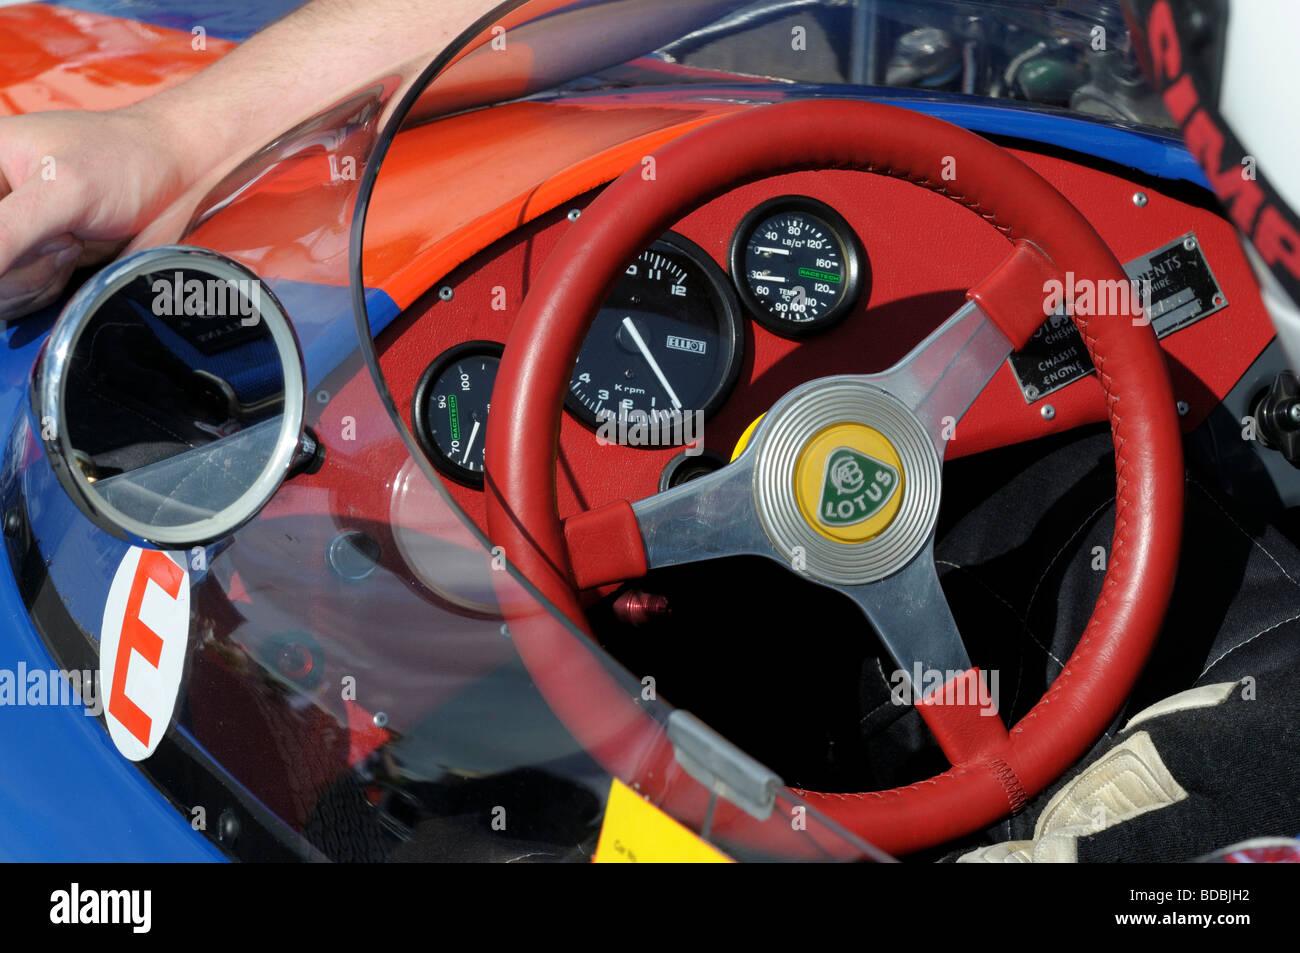 Lotus racing car cockpit Silverstone Classic 2009 - Stock Image